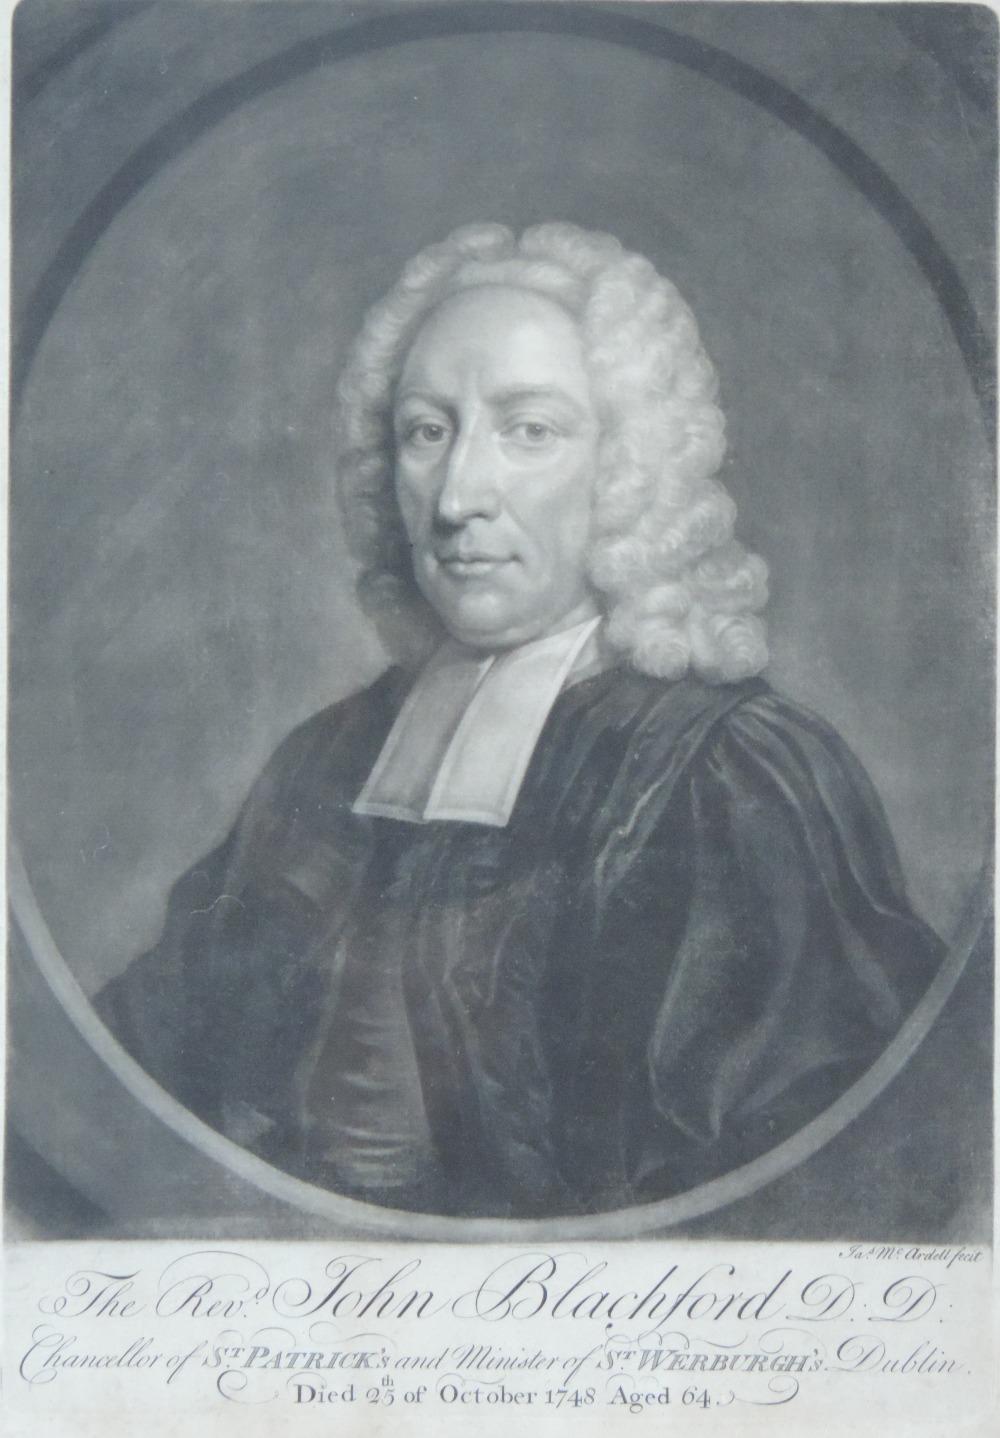 Lot 57 - James Mc Ardell, Engraver